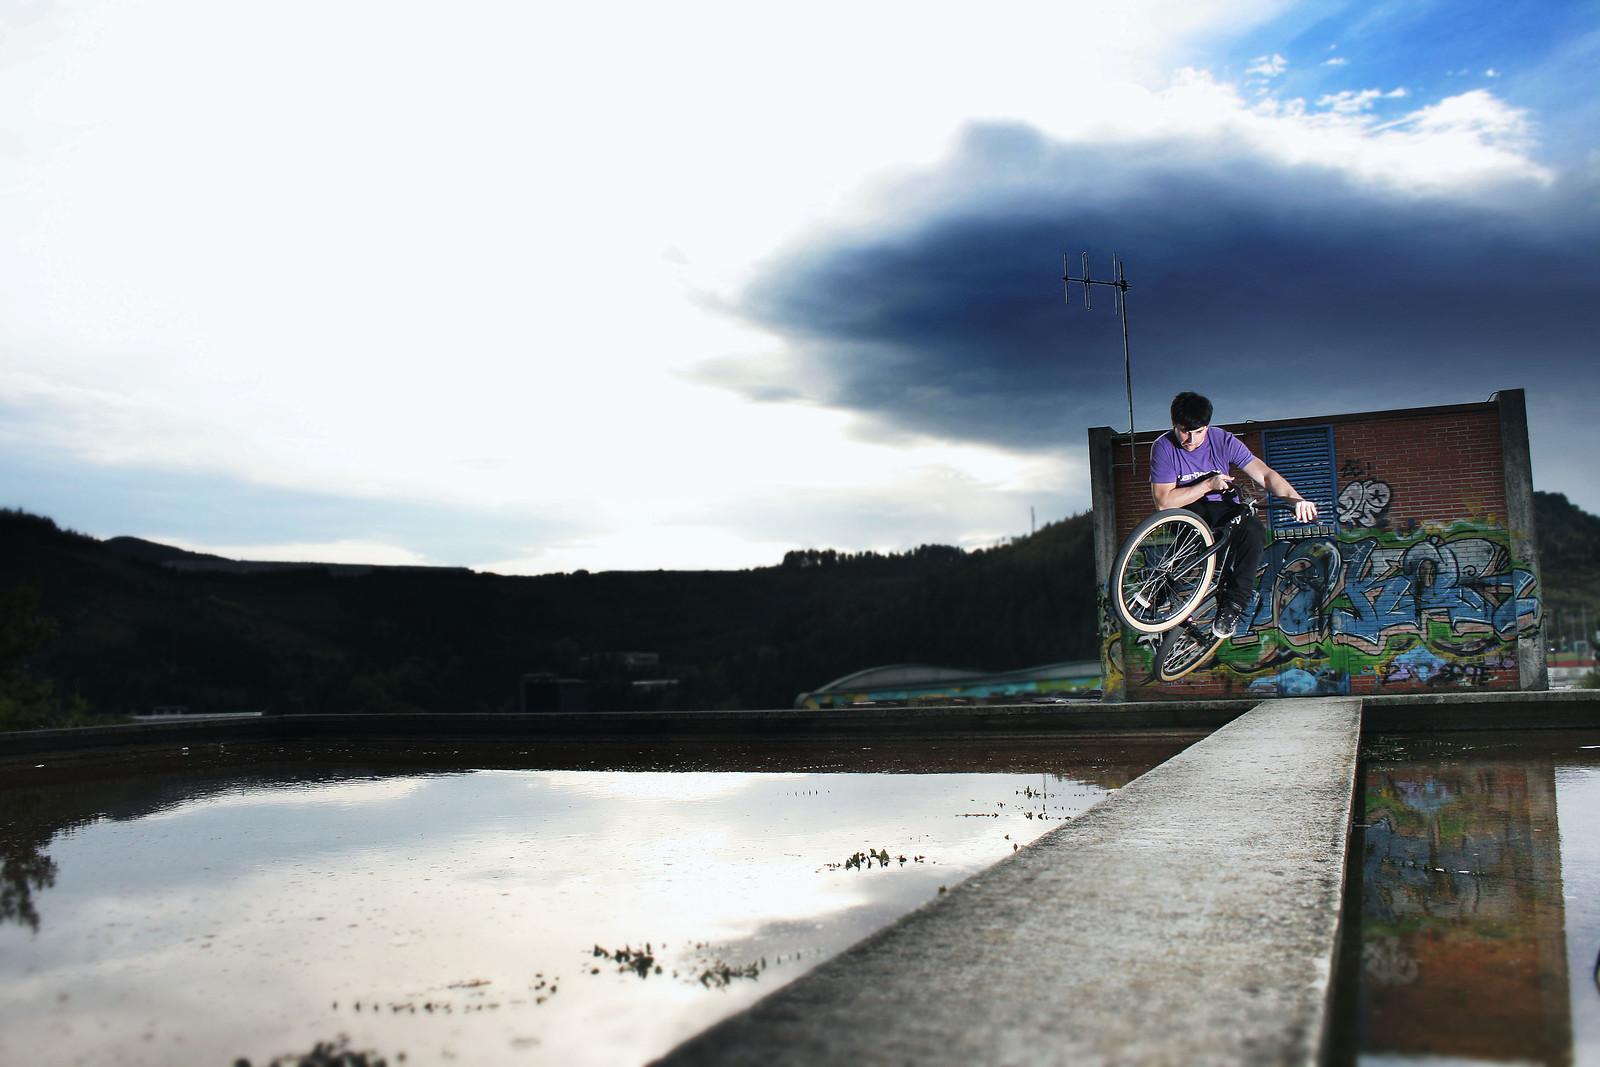 bunny table top - egino - Mountain Biking Pictures - Vital MTB